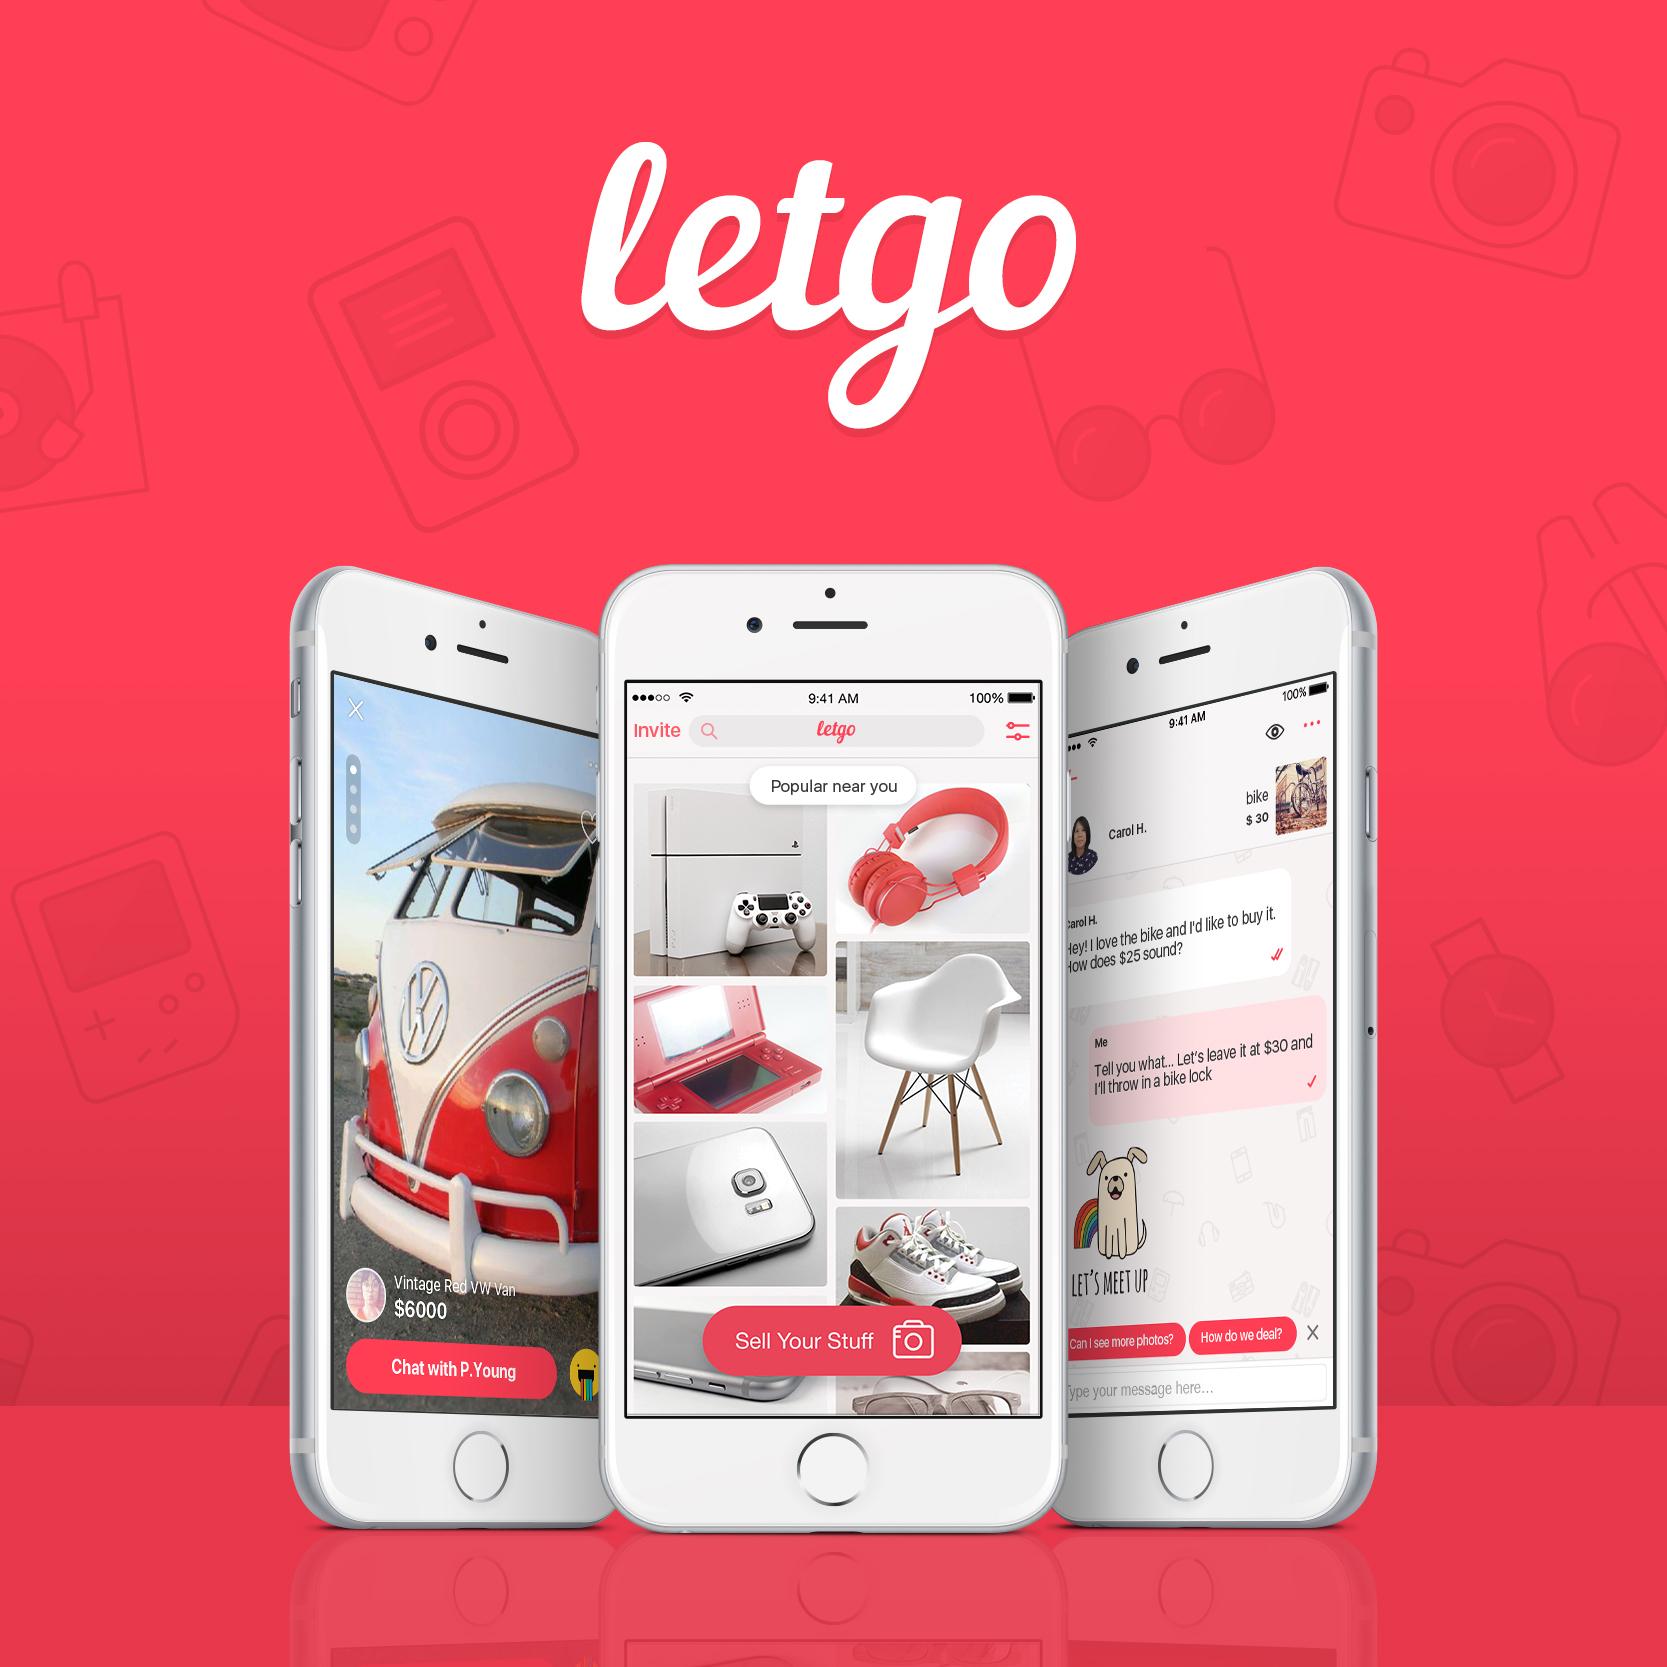 letgo_bonsai_partners_venture_capital_3.jpg